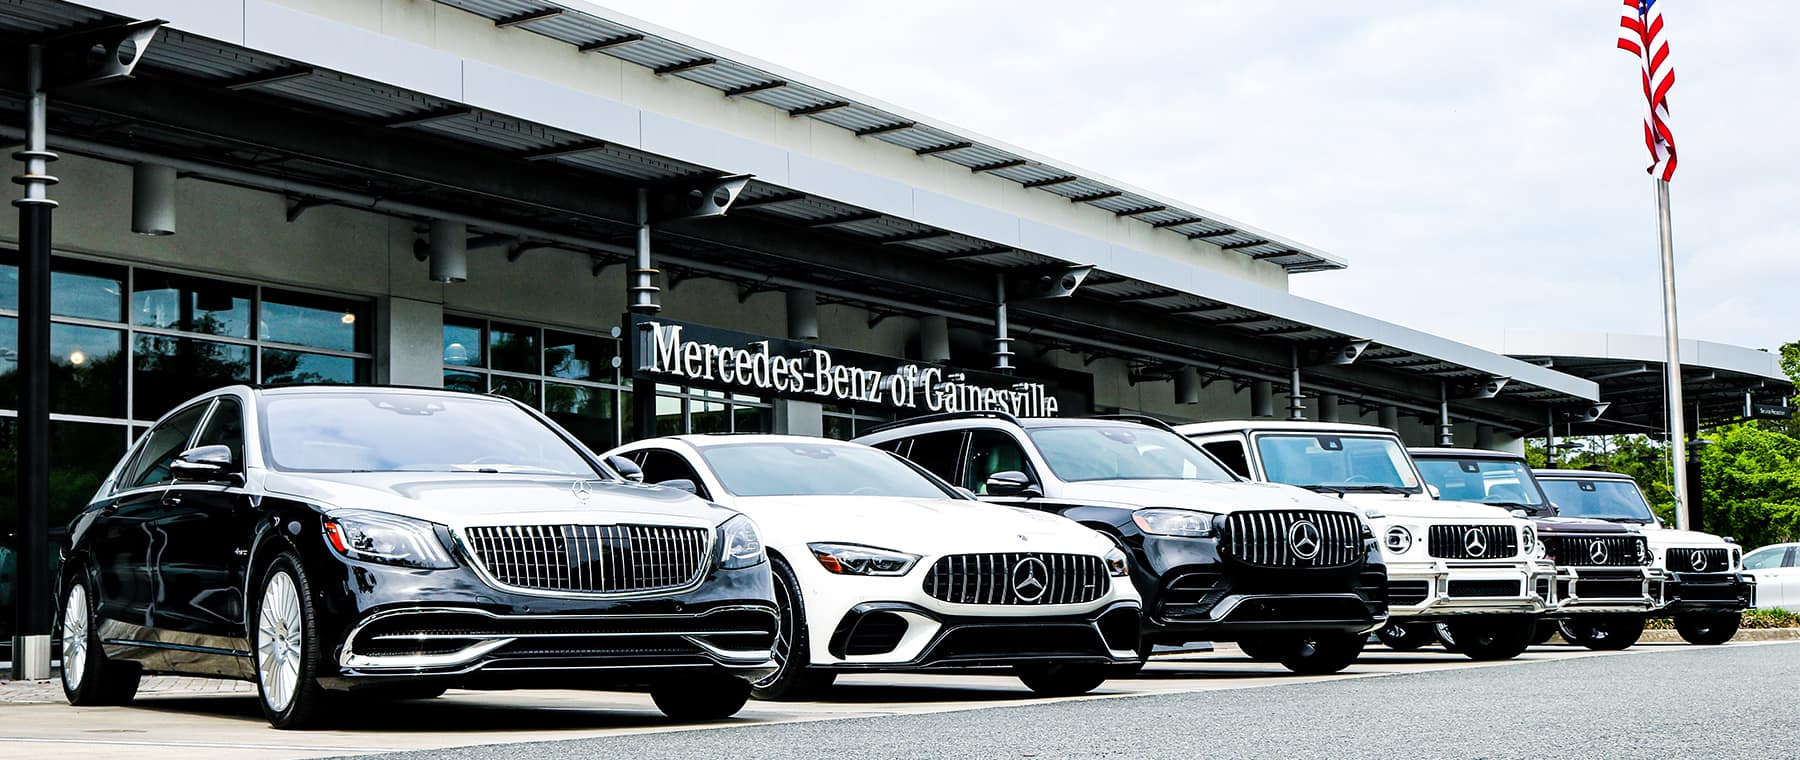 Mercedes-Benz of Gainesville Storefront